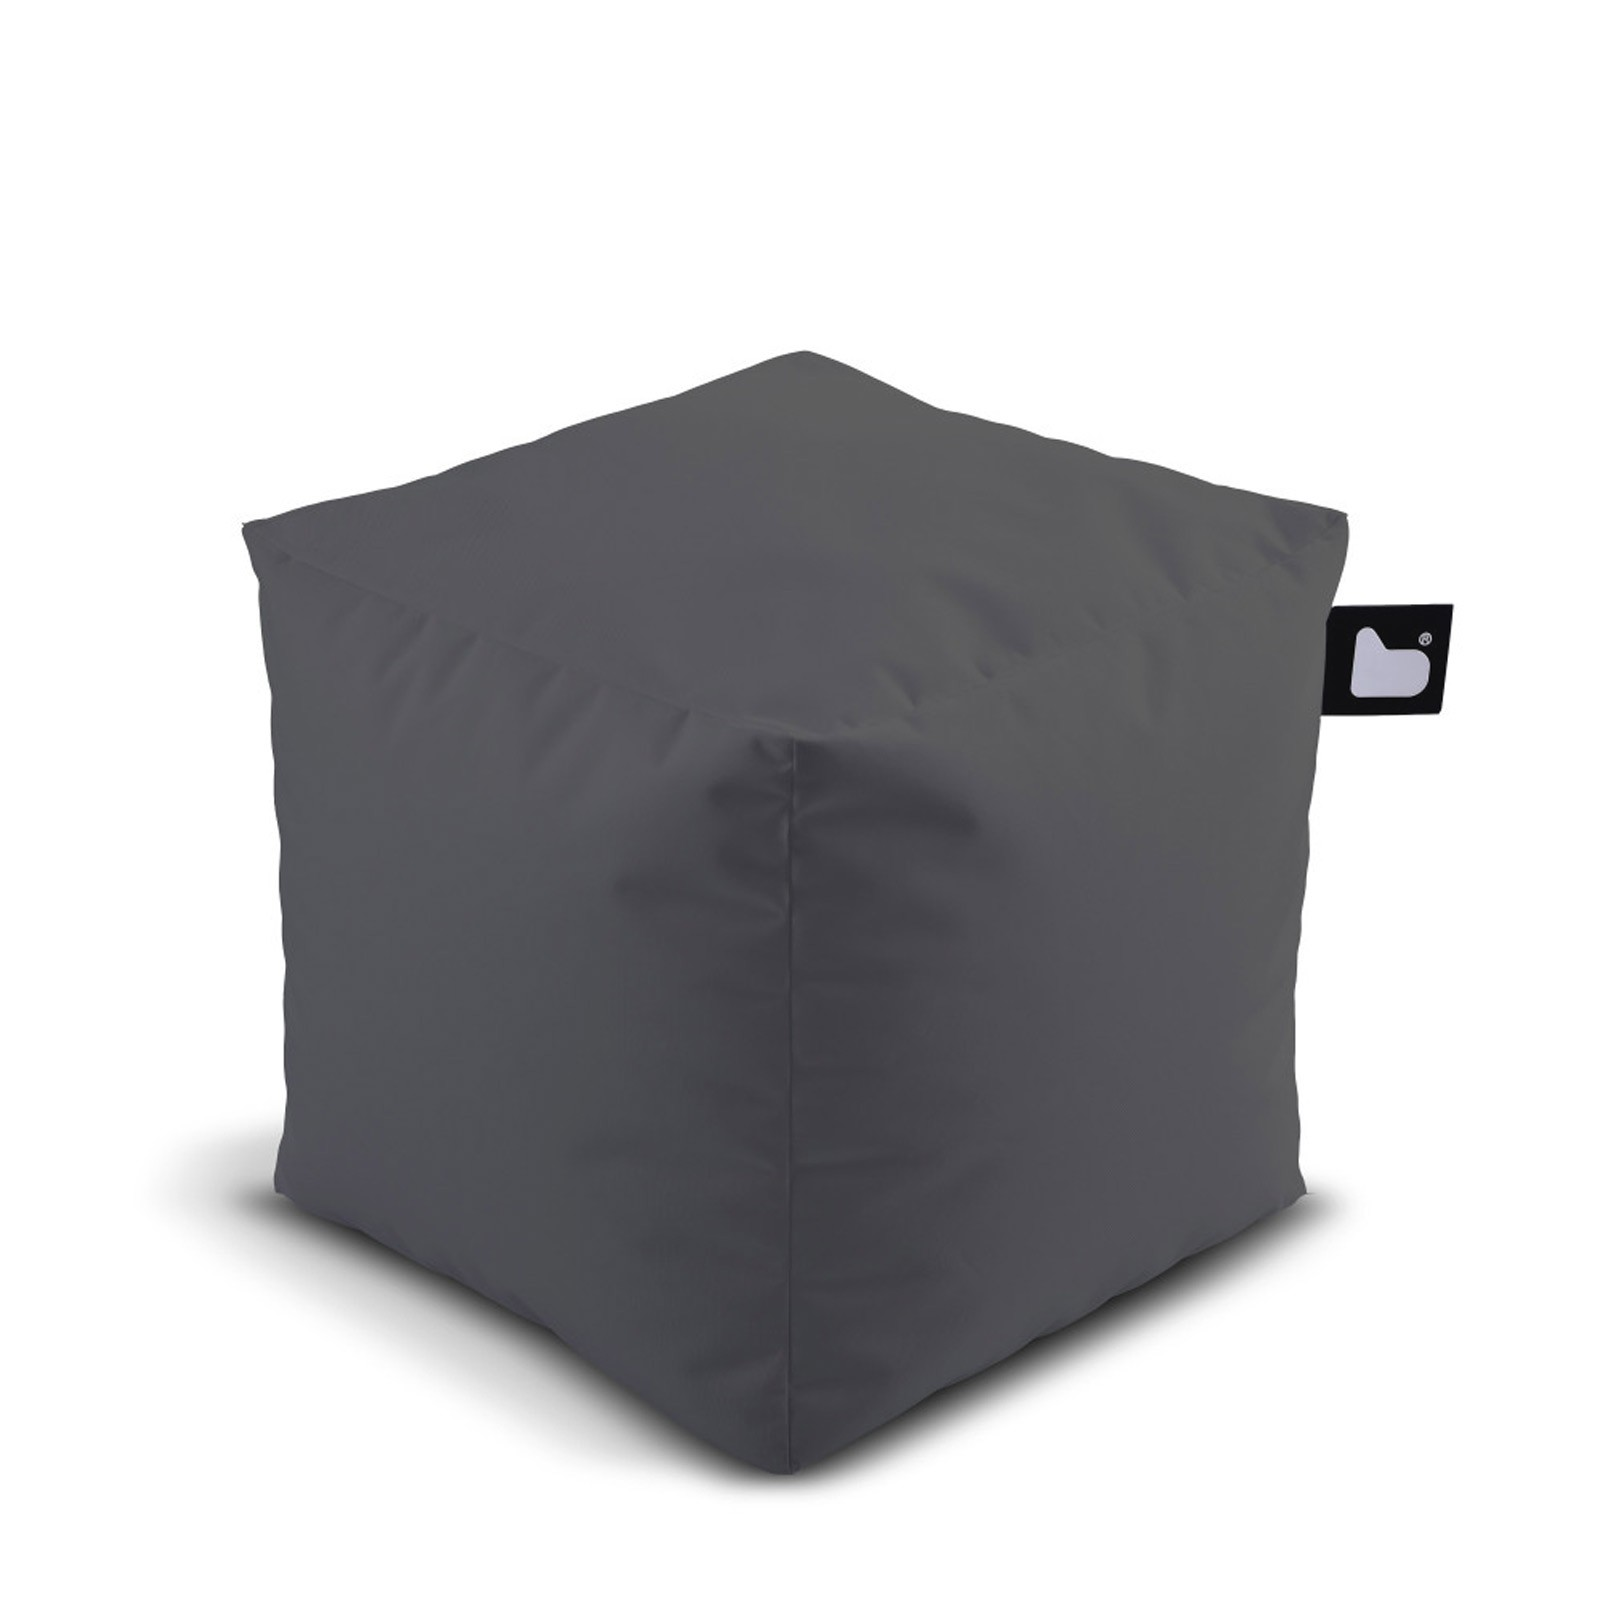 b-bag Extreme Lounging Sitzwürfel/Fußhocker Indoor-/Outdoor b-box Farbe Grey